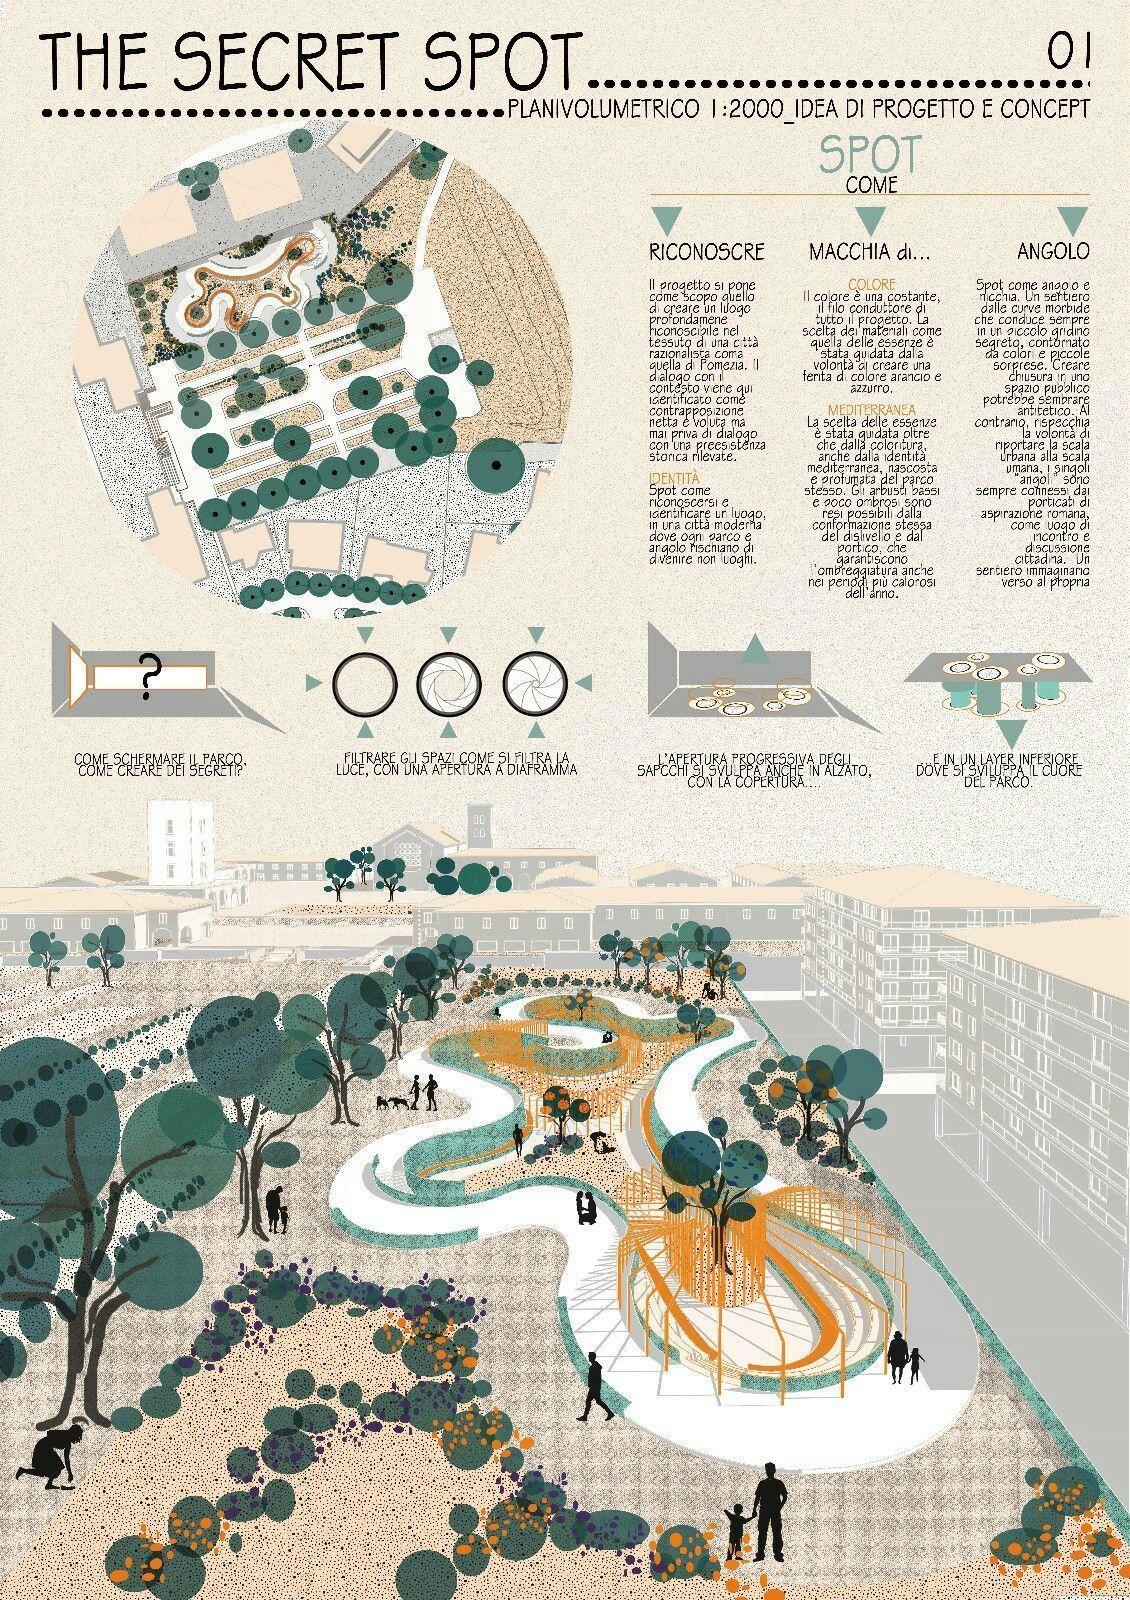 Paisaje Arquitectura Diseno De Jardines Plaza Publica Concurso Para Un Dibujo De Arquitectura Laminas De Presentacion Arquitectura Laminas De Arquitectura